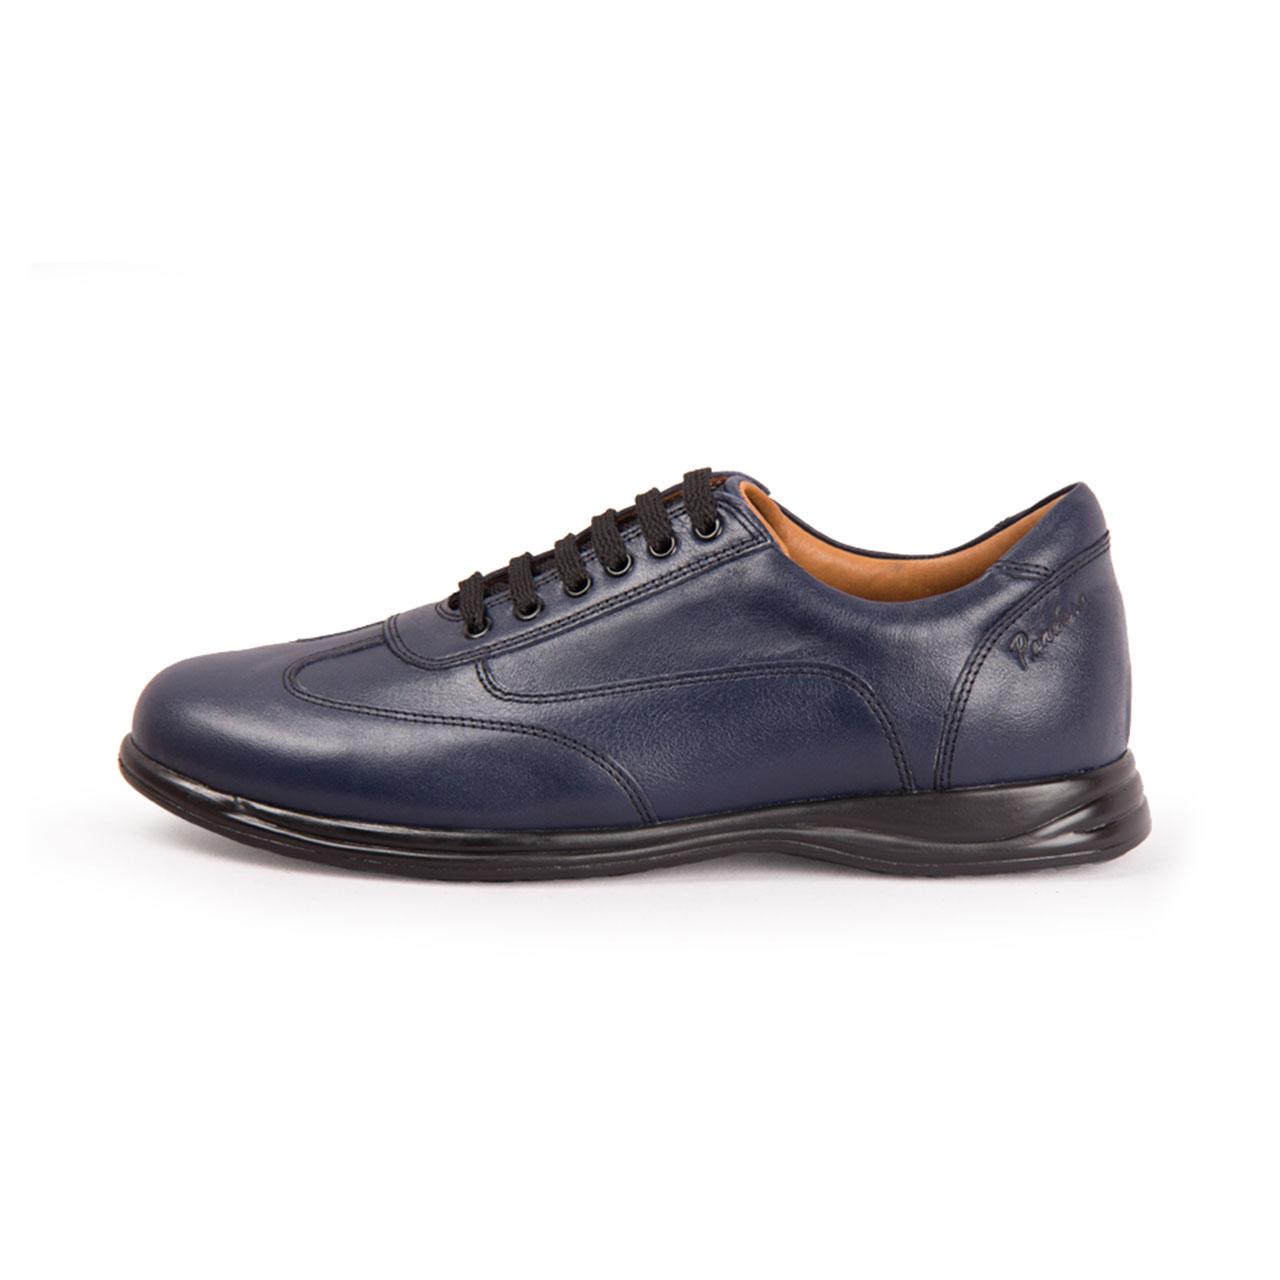 کفش مردانه چرم طبیعی پاندورا مدل m1050 سرمه ای